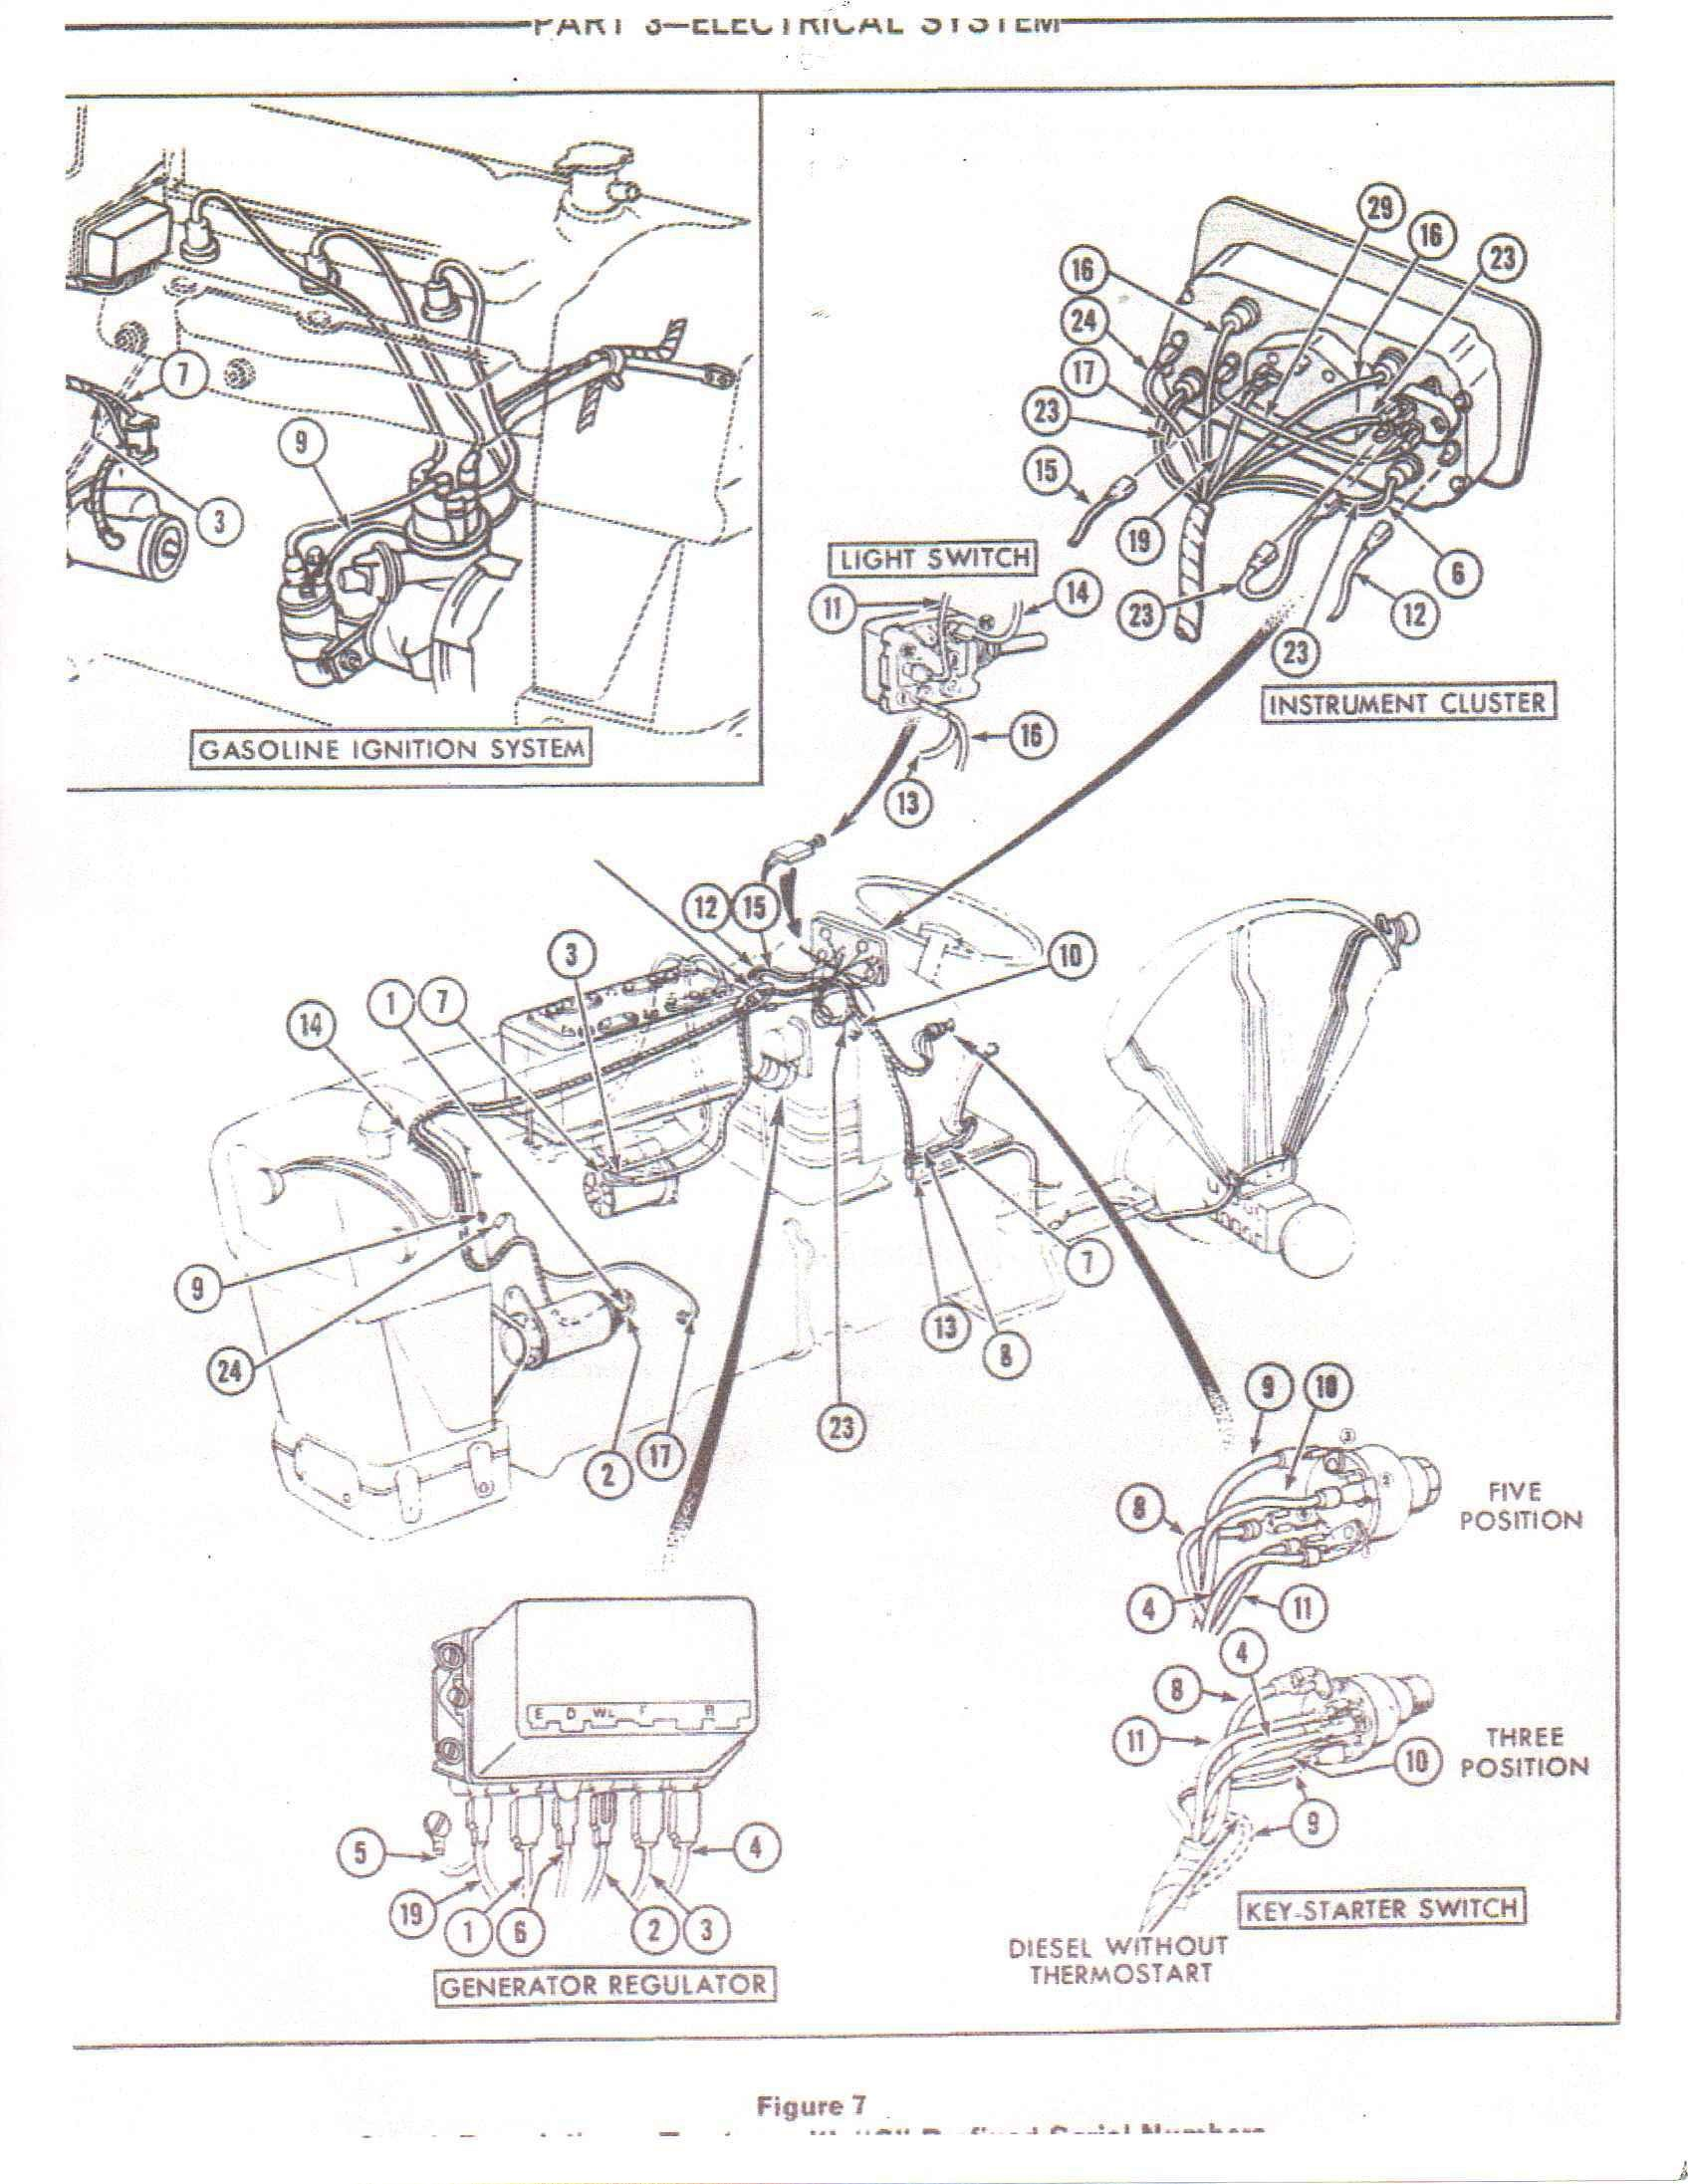 Ford tractor alternator wiring diagram elegant wiring diagram image